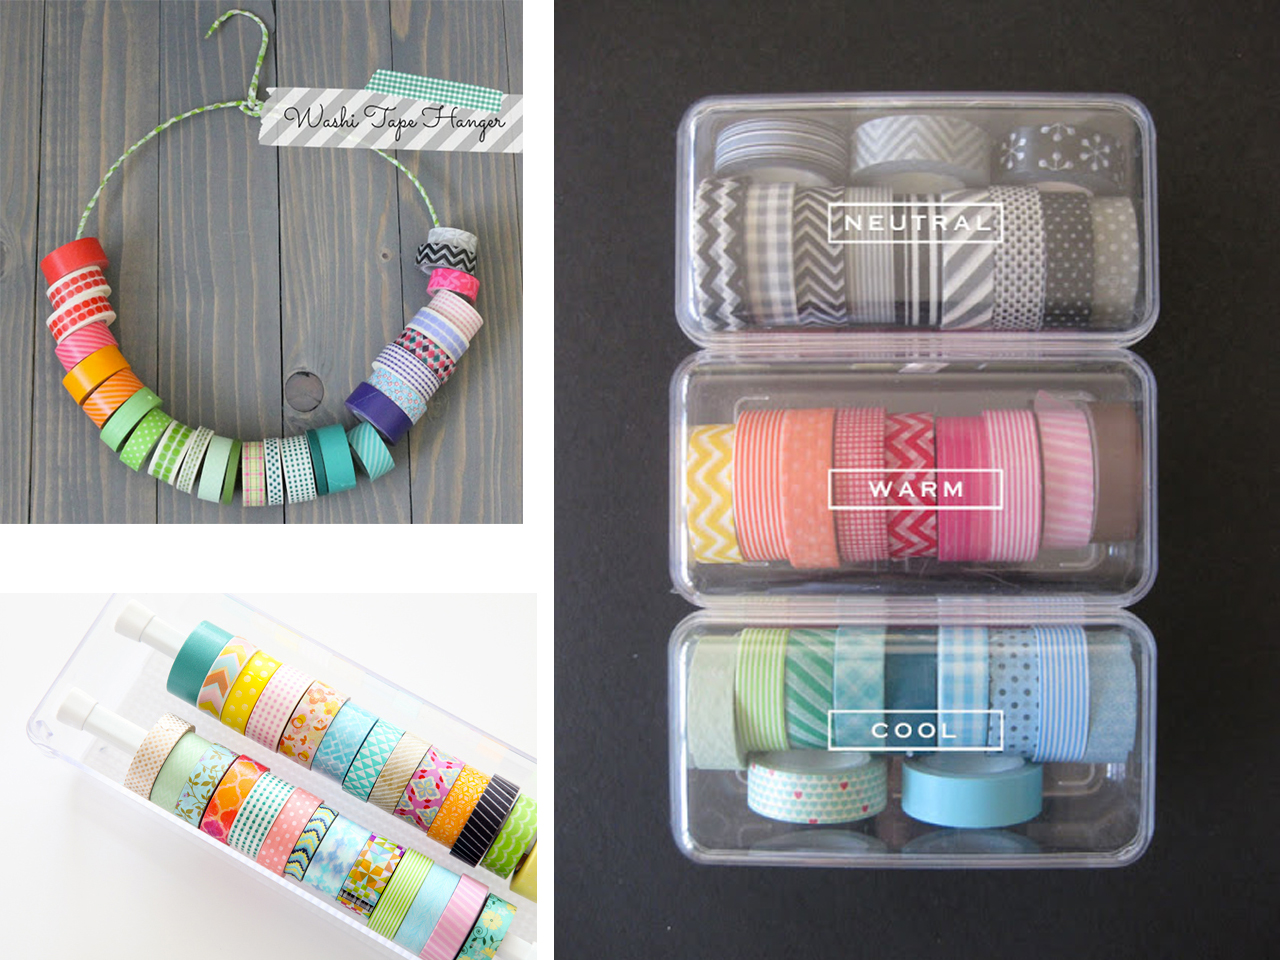 Otras bonitas ideas para organizar washi tape